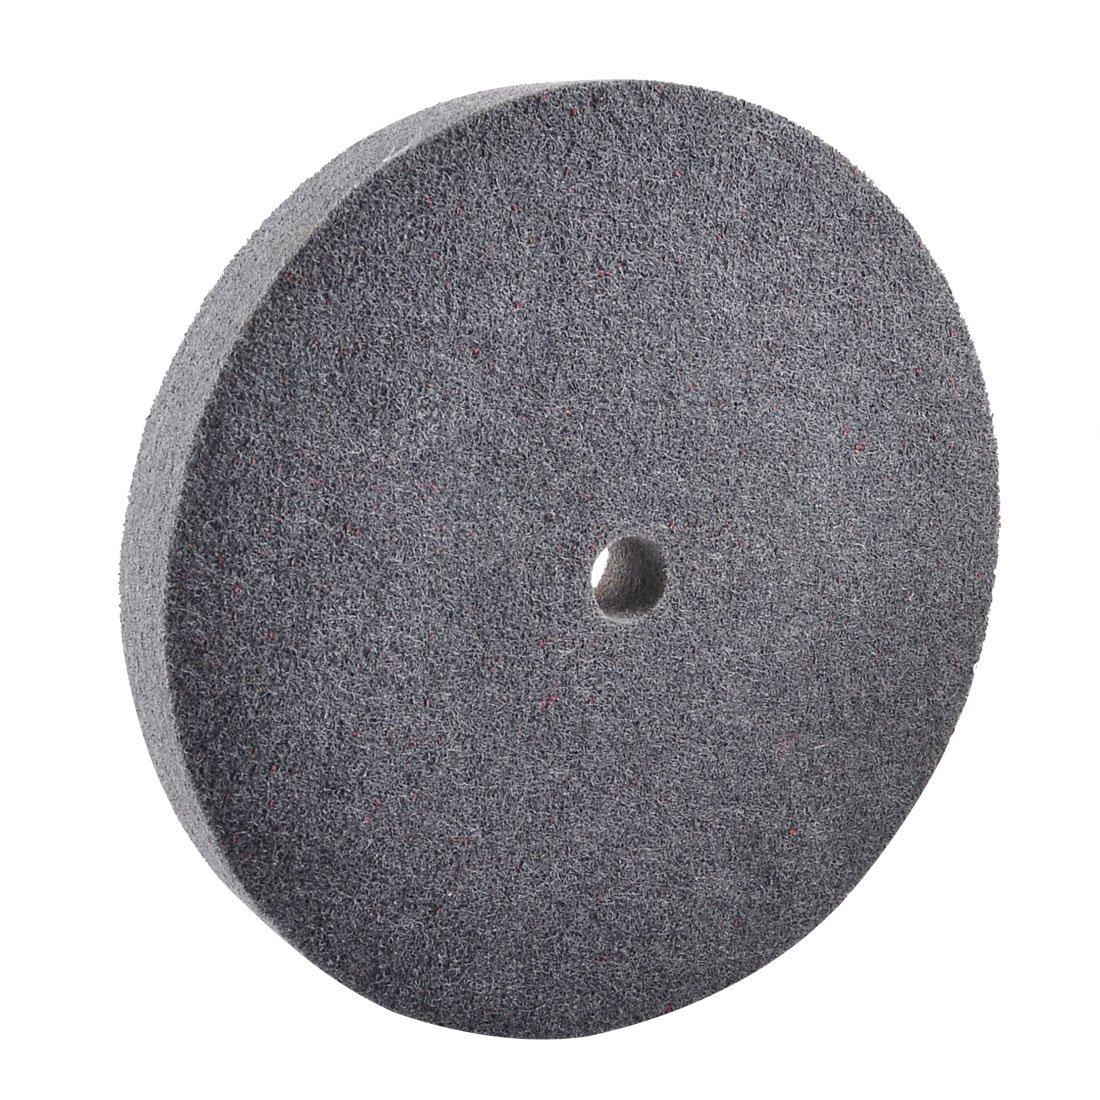 20,32 cm de di/ámetro exterior 12 P 320 320320# Grano gris nailon disco para ruedas de pulido